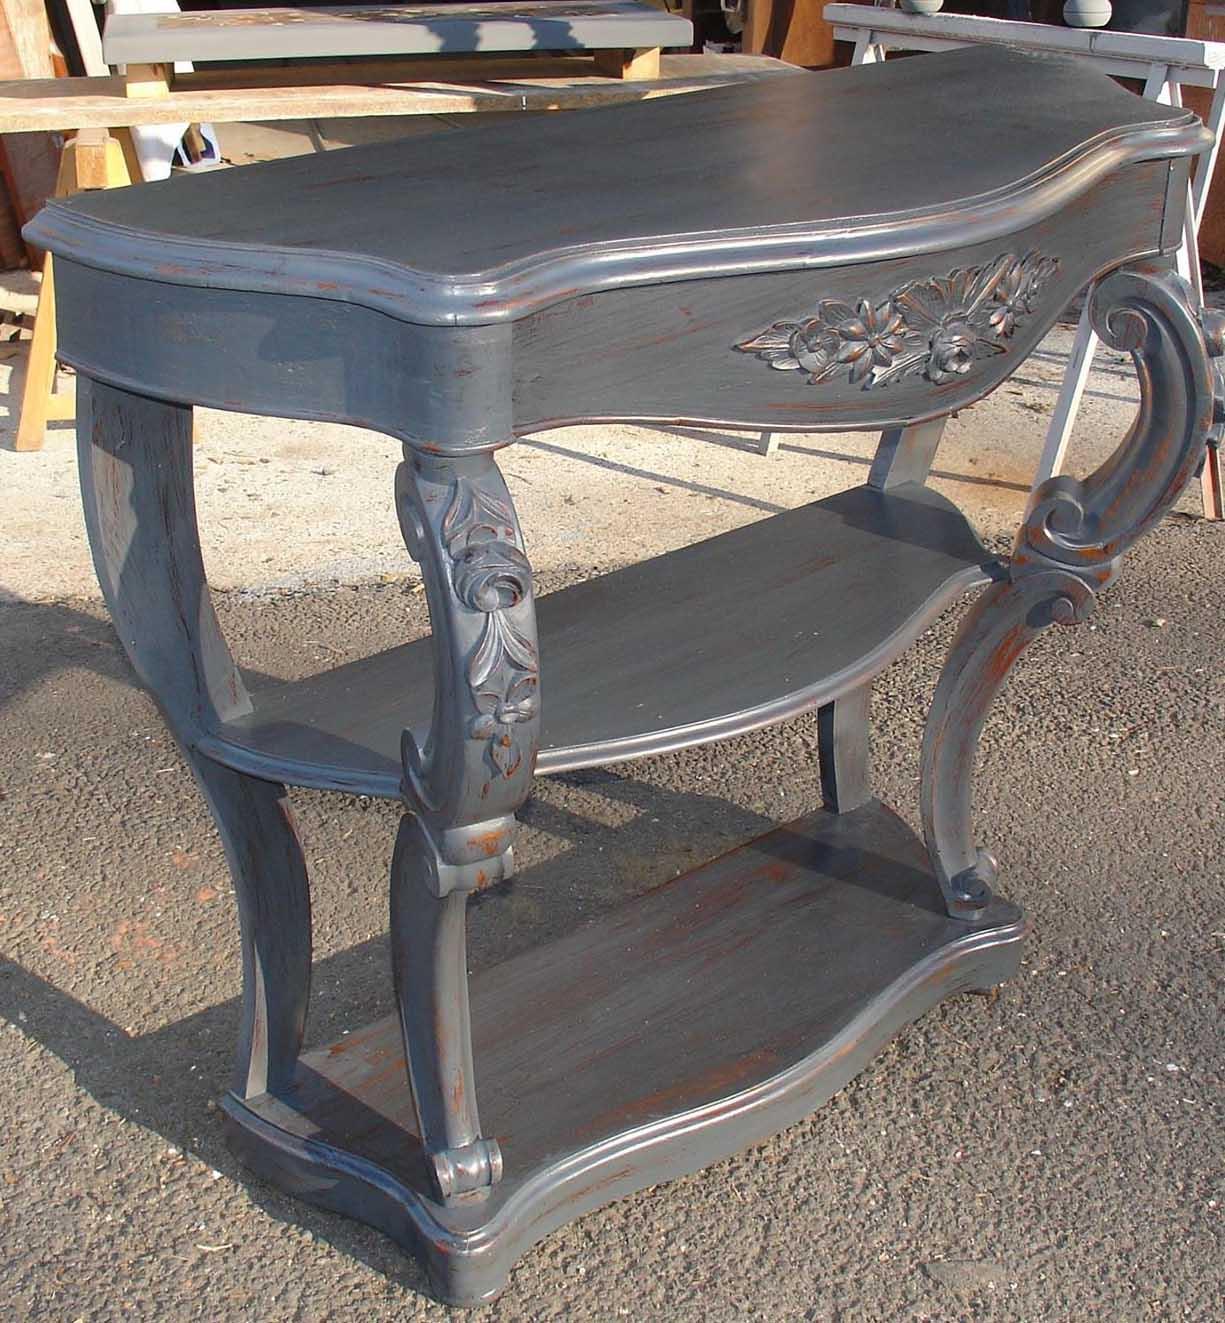 relooker table en verre cool personne relooker une table de cuisine rose mat ile comptoirs. Black Bedroom Furniture Sets. Home Design Ideas